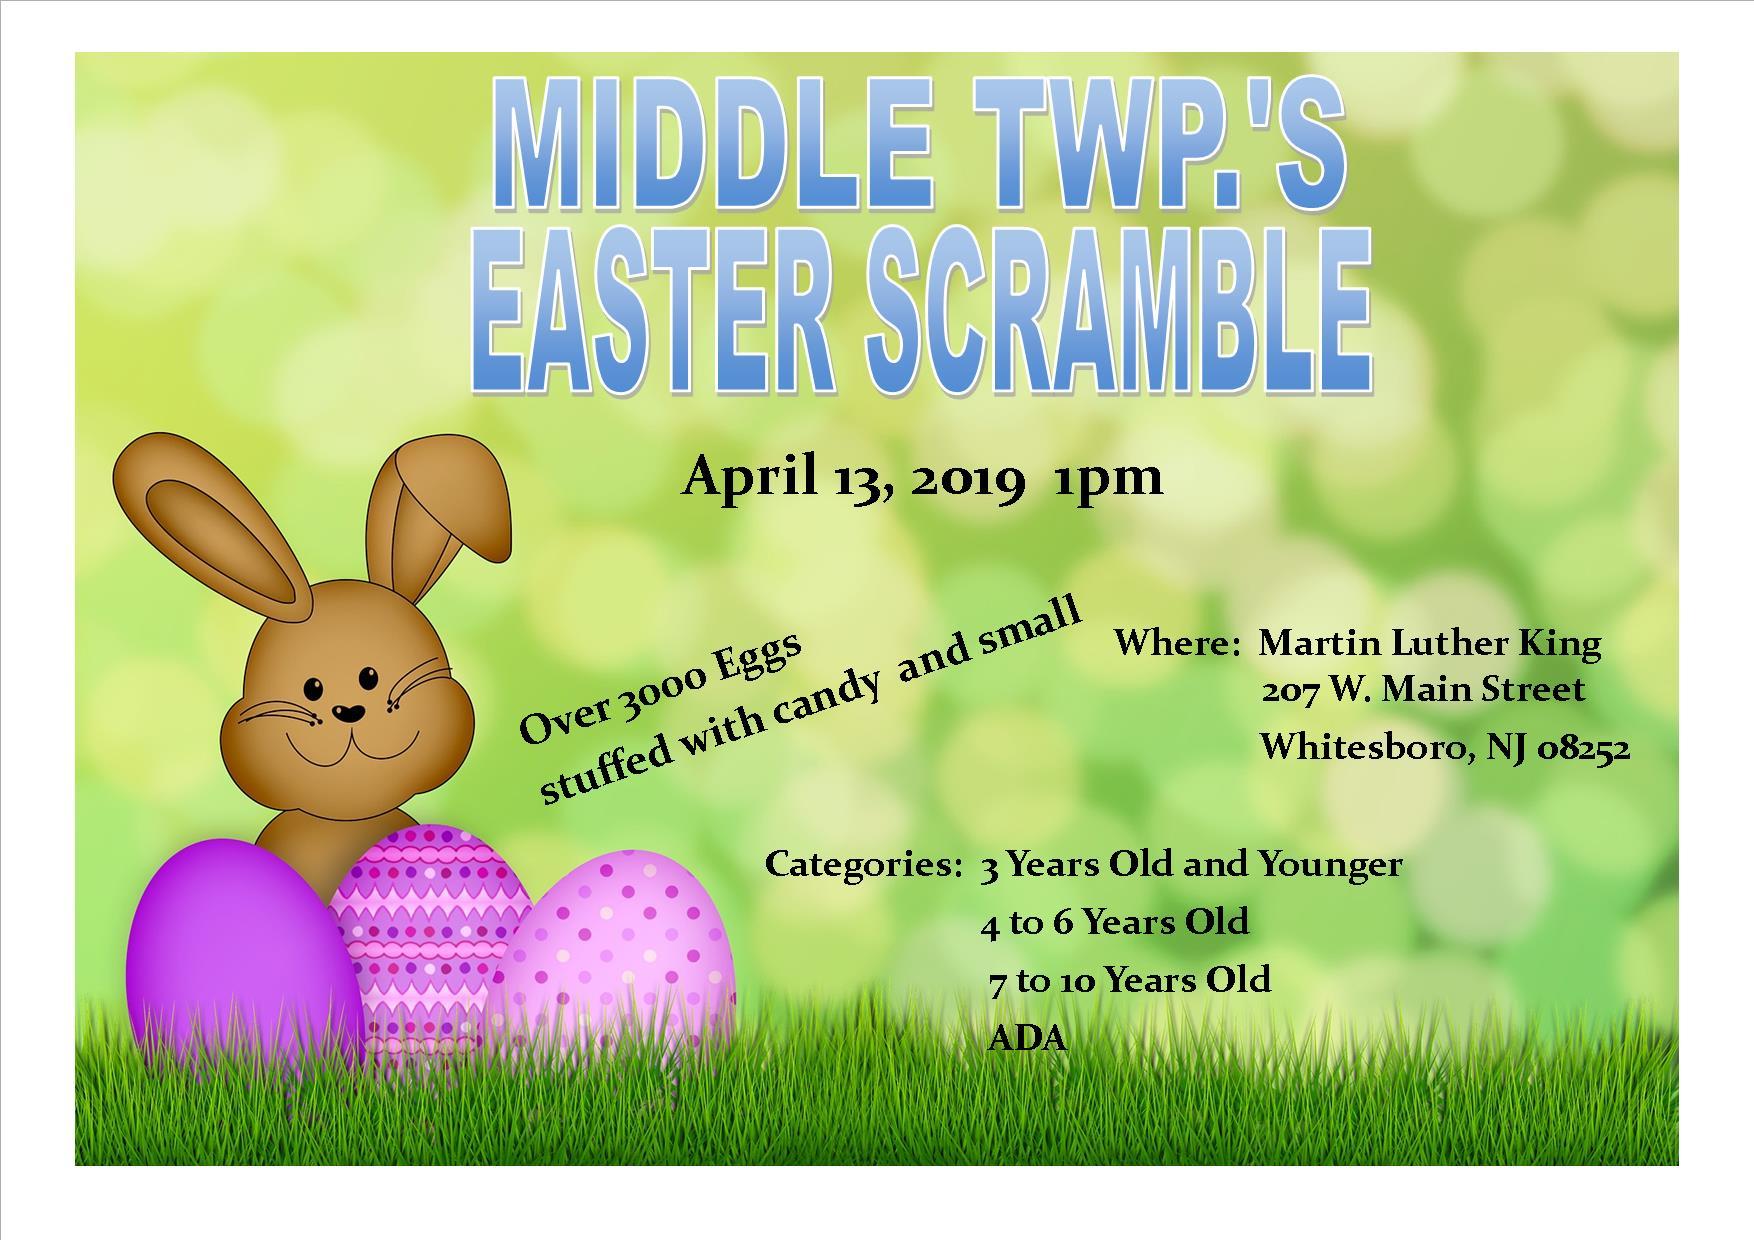 023b93a9e2 Middle Township Easter Scramble Saturday April 13th